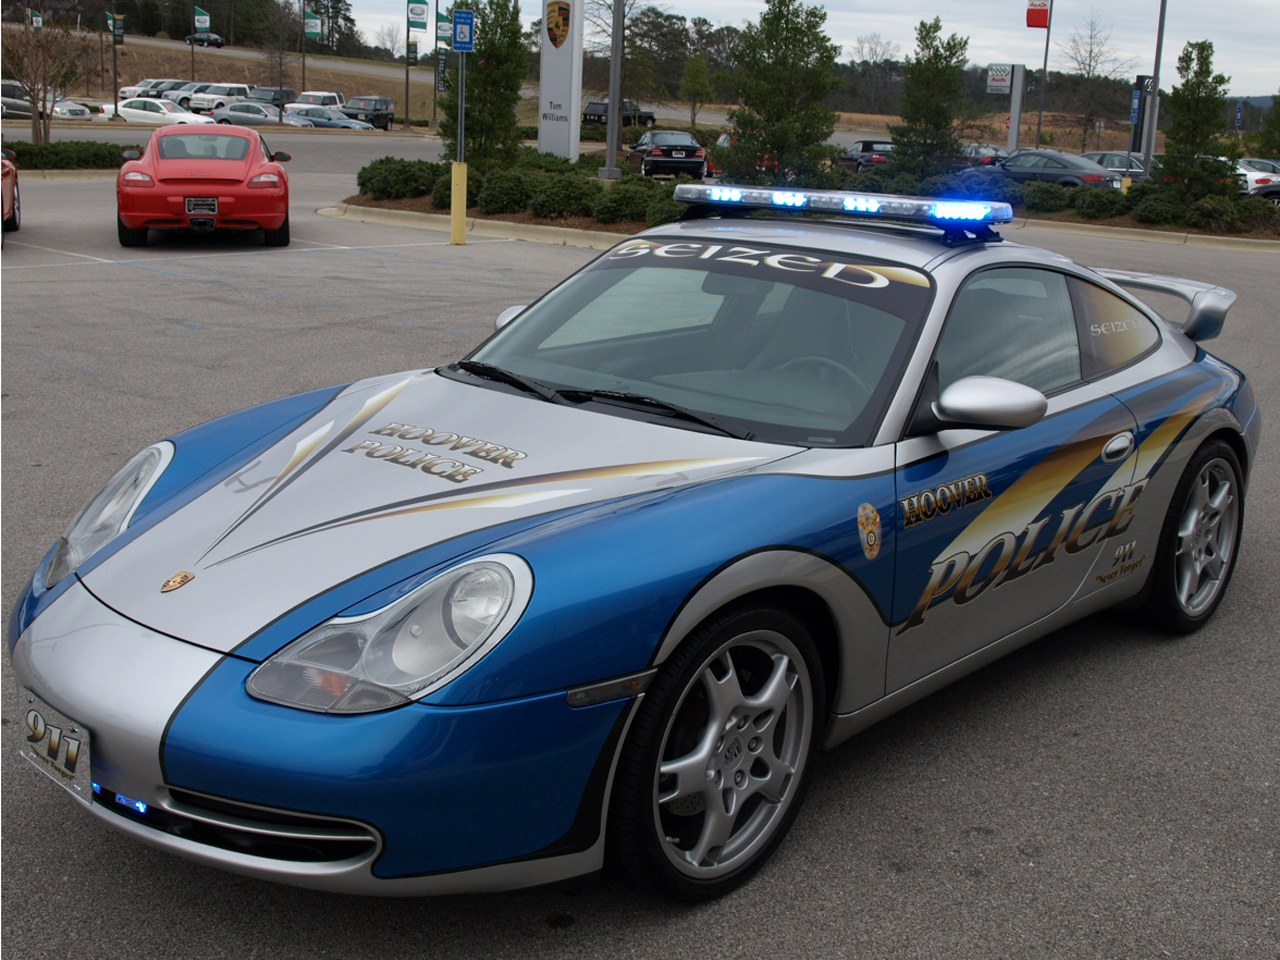 Alabama_Police_Porsche_911_1.jpg